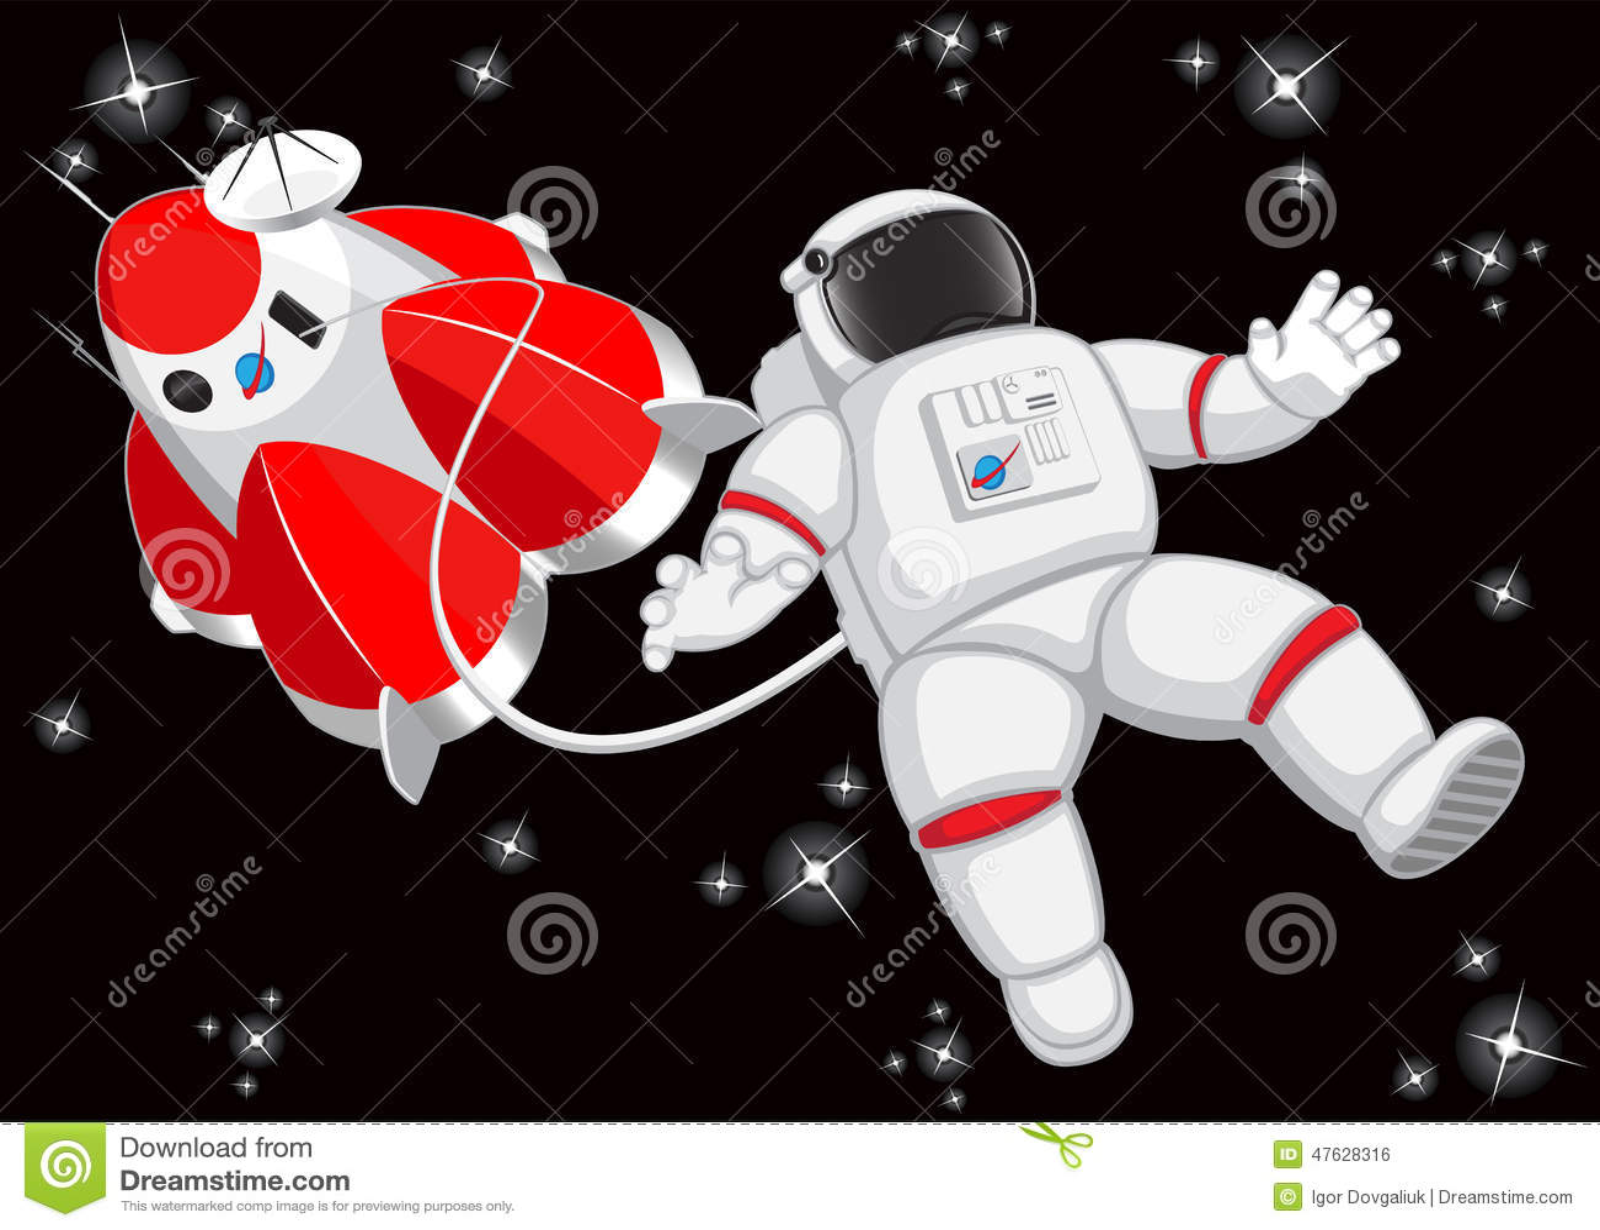 Astronaut Space Adventure Cartoon Vector